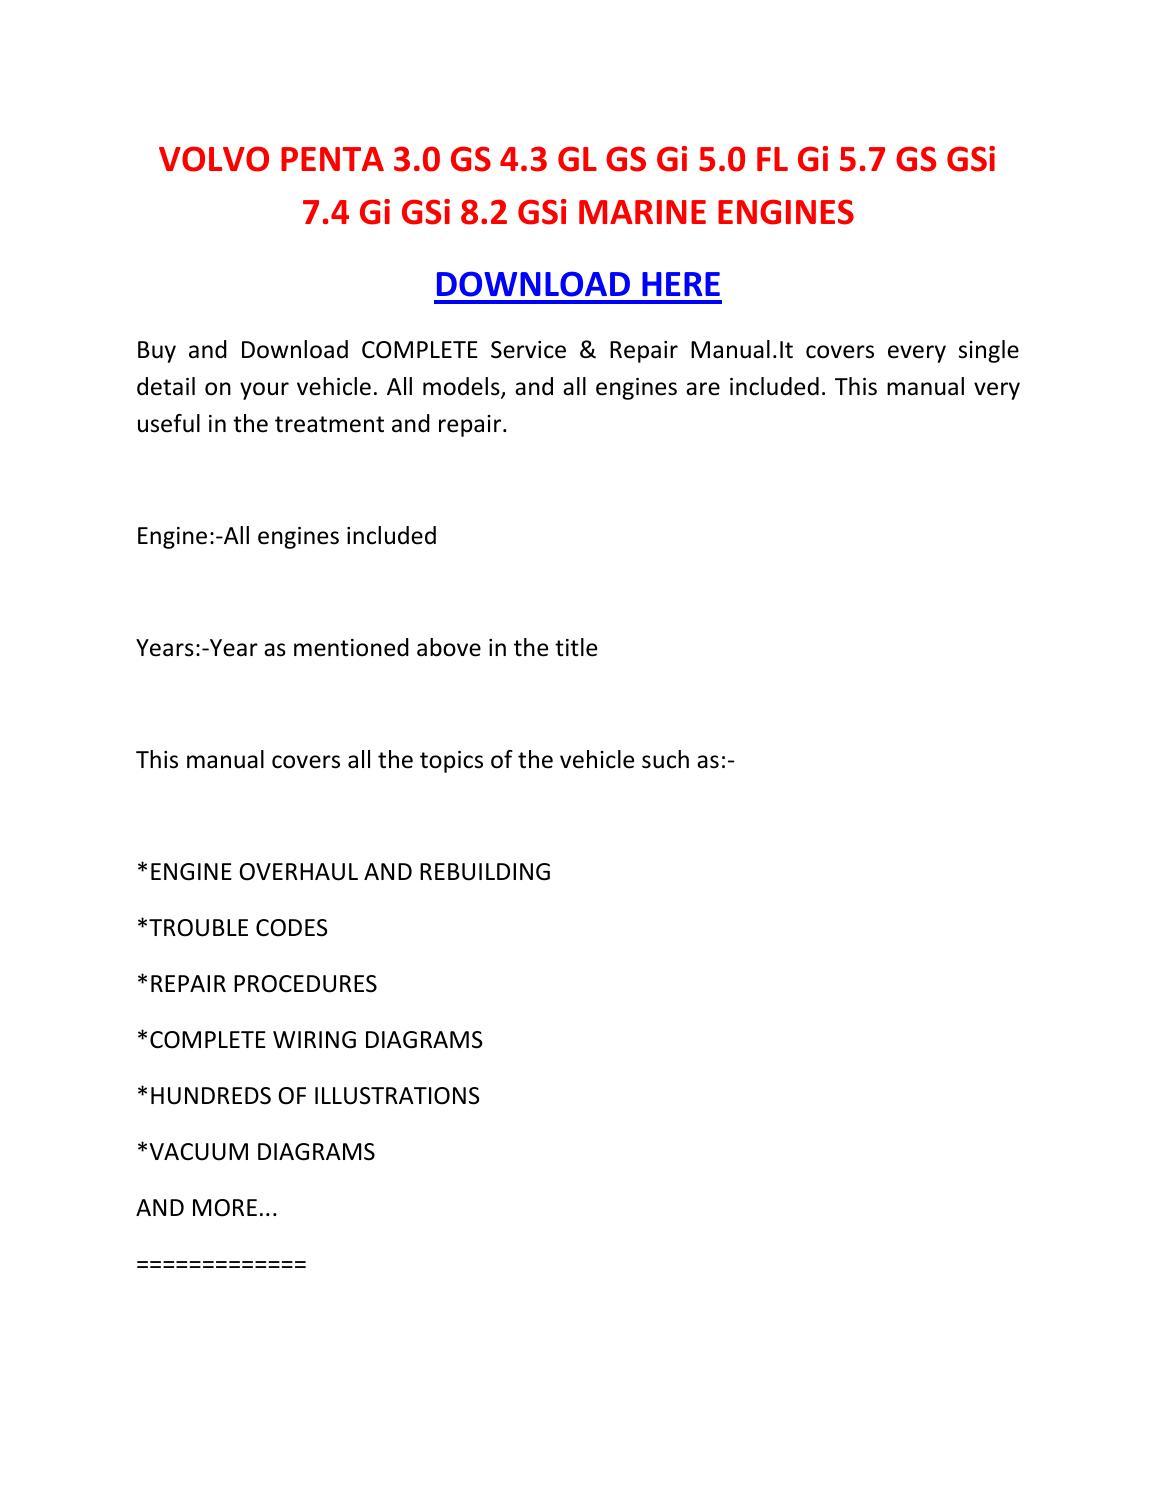 volvo penta 3 0 gs 4 3 gl gs gi 5 0 fl gi 5 7 gs gsi 7 4 gi gsi 8 2 gsi  marine engines